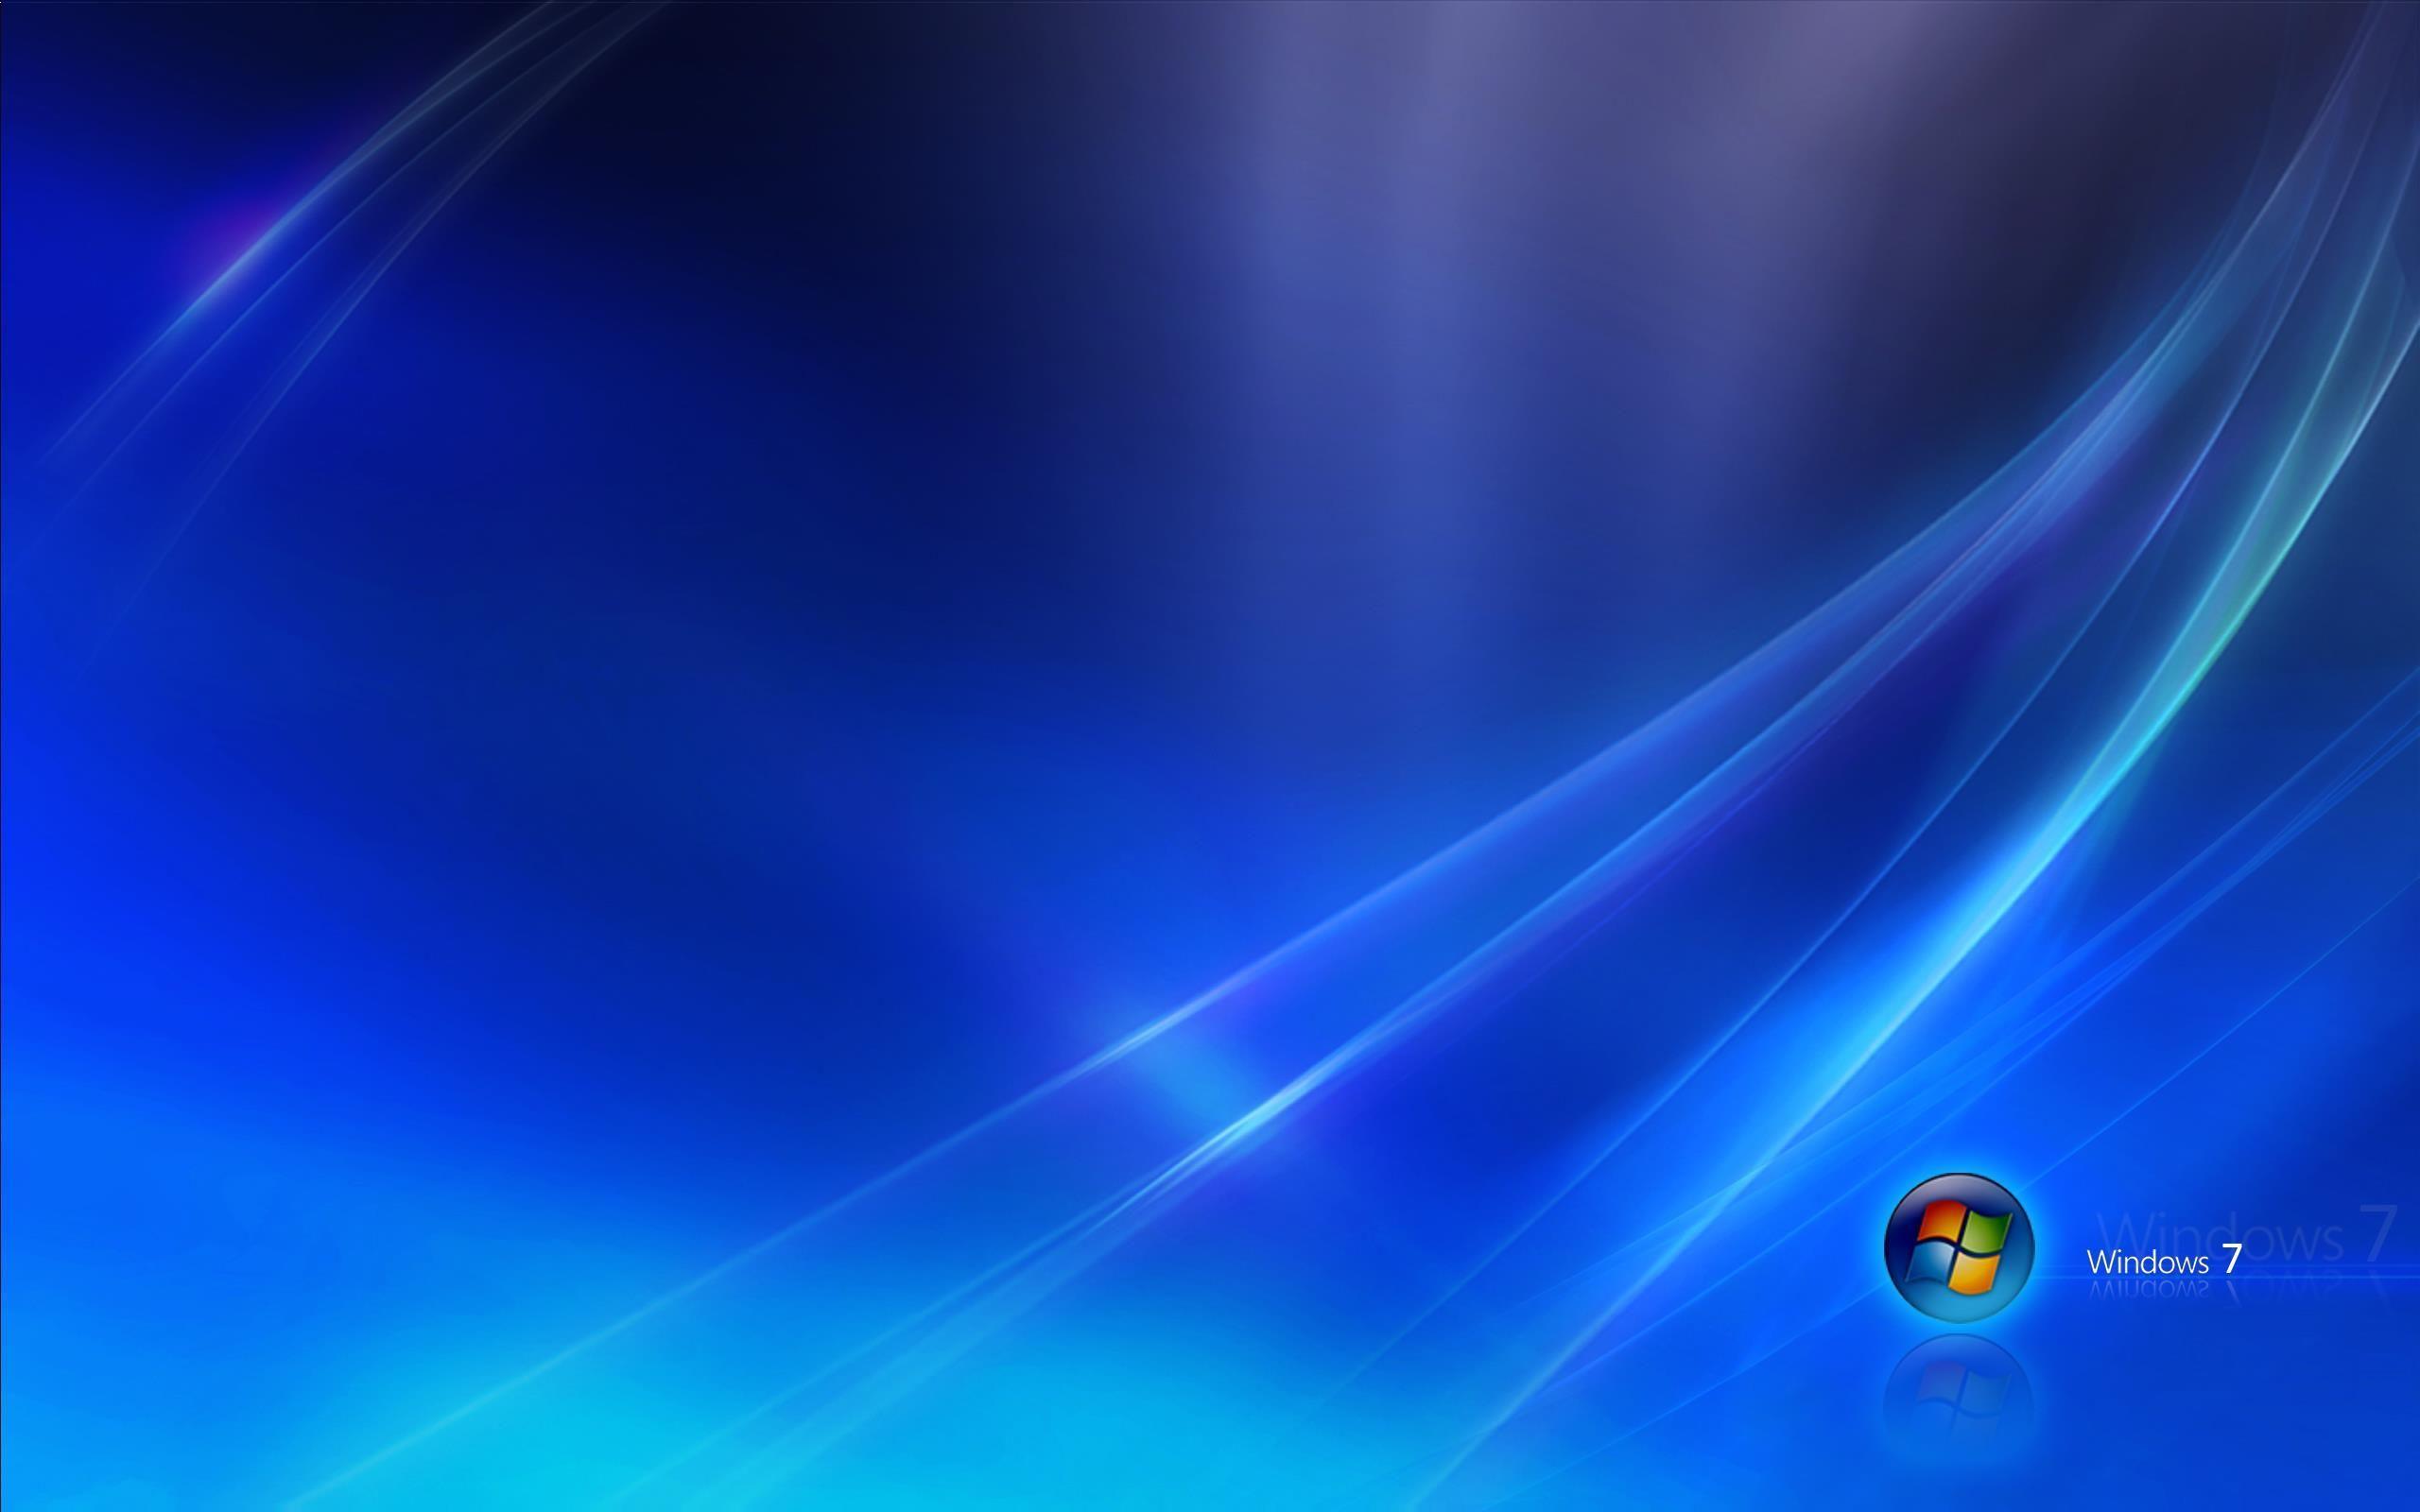 Des Fonds D Ecran Pour Windows 7 Fonds D Ecran Gratuits By Unesourisetmoi Fond Ecran Bleu Fond D Ecran Large Fond Ecran Samsung